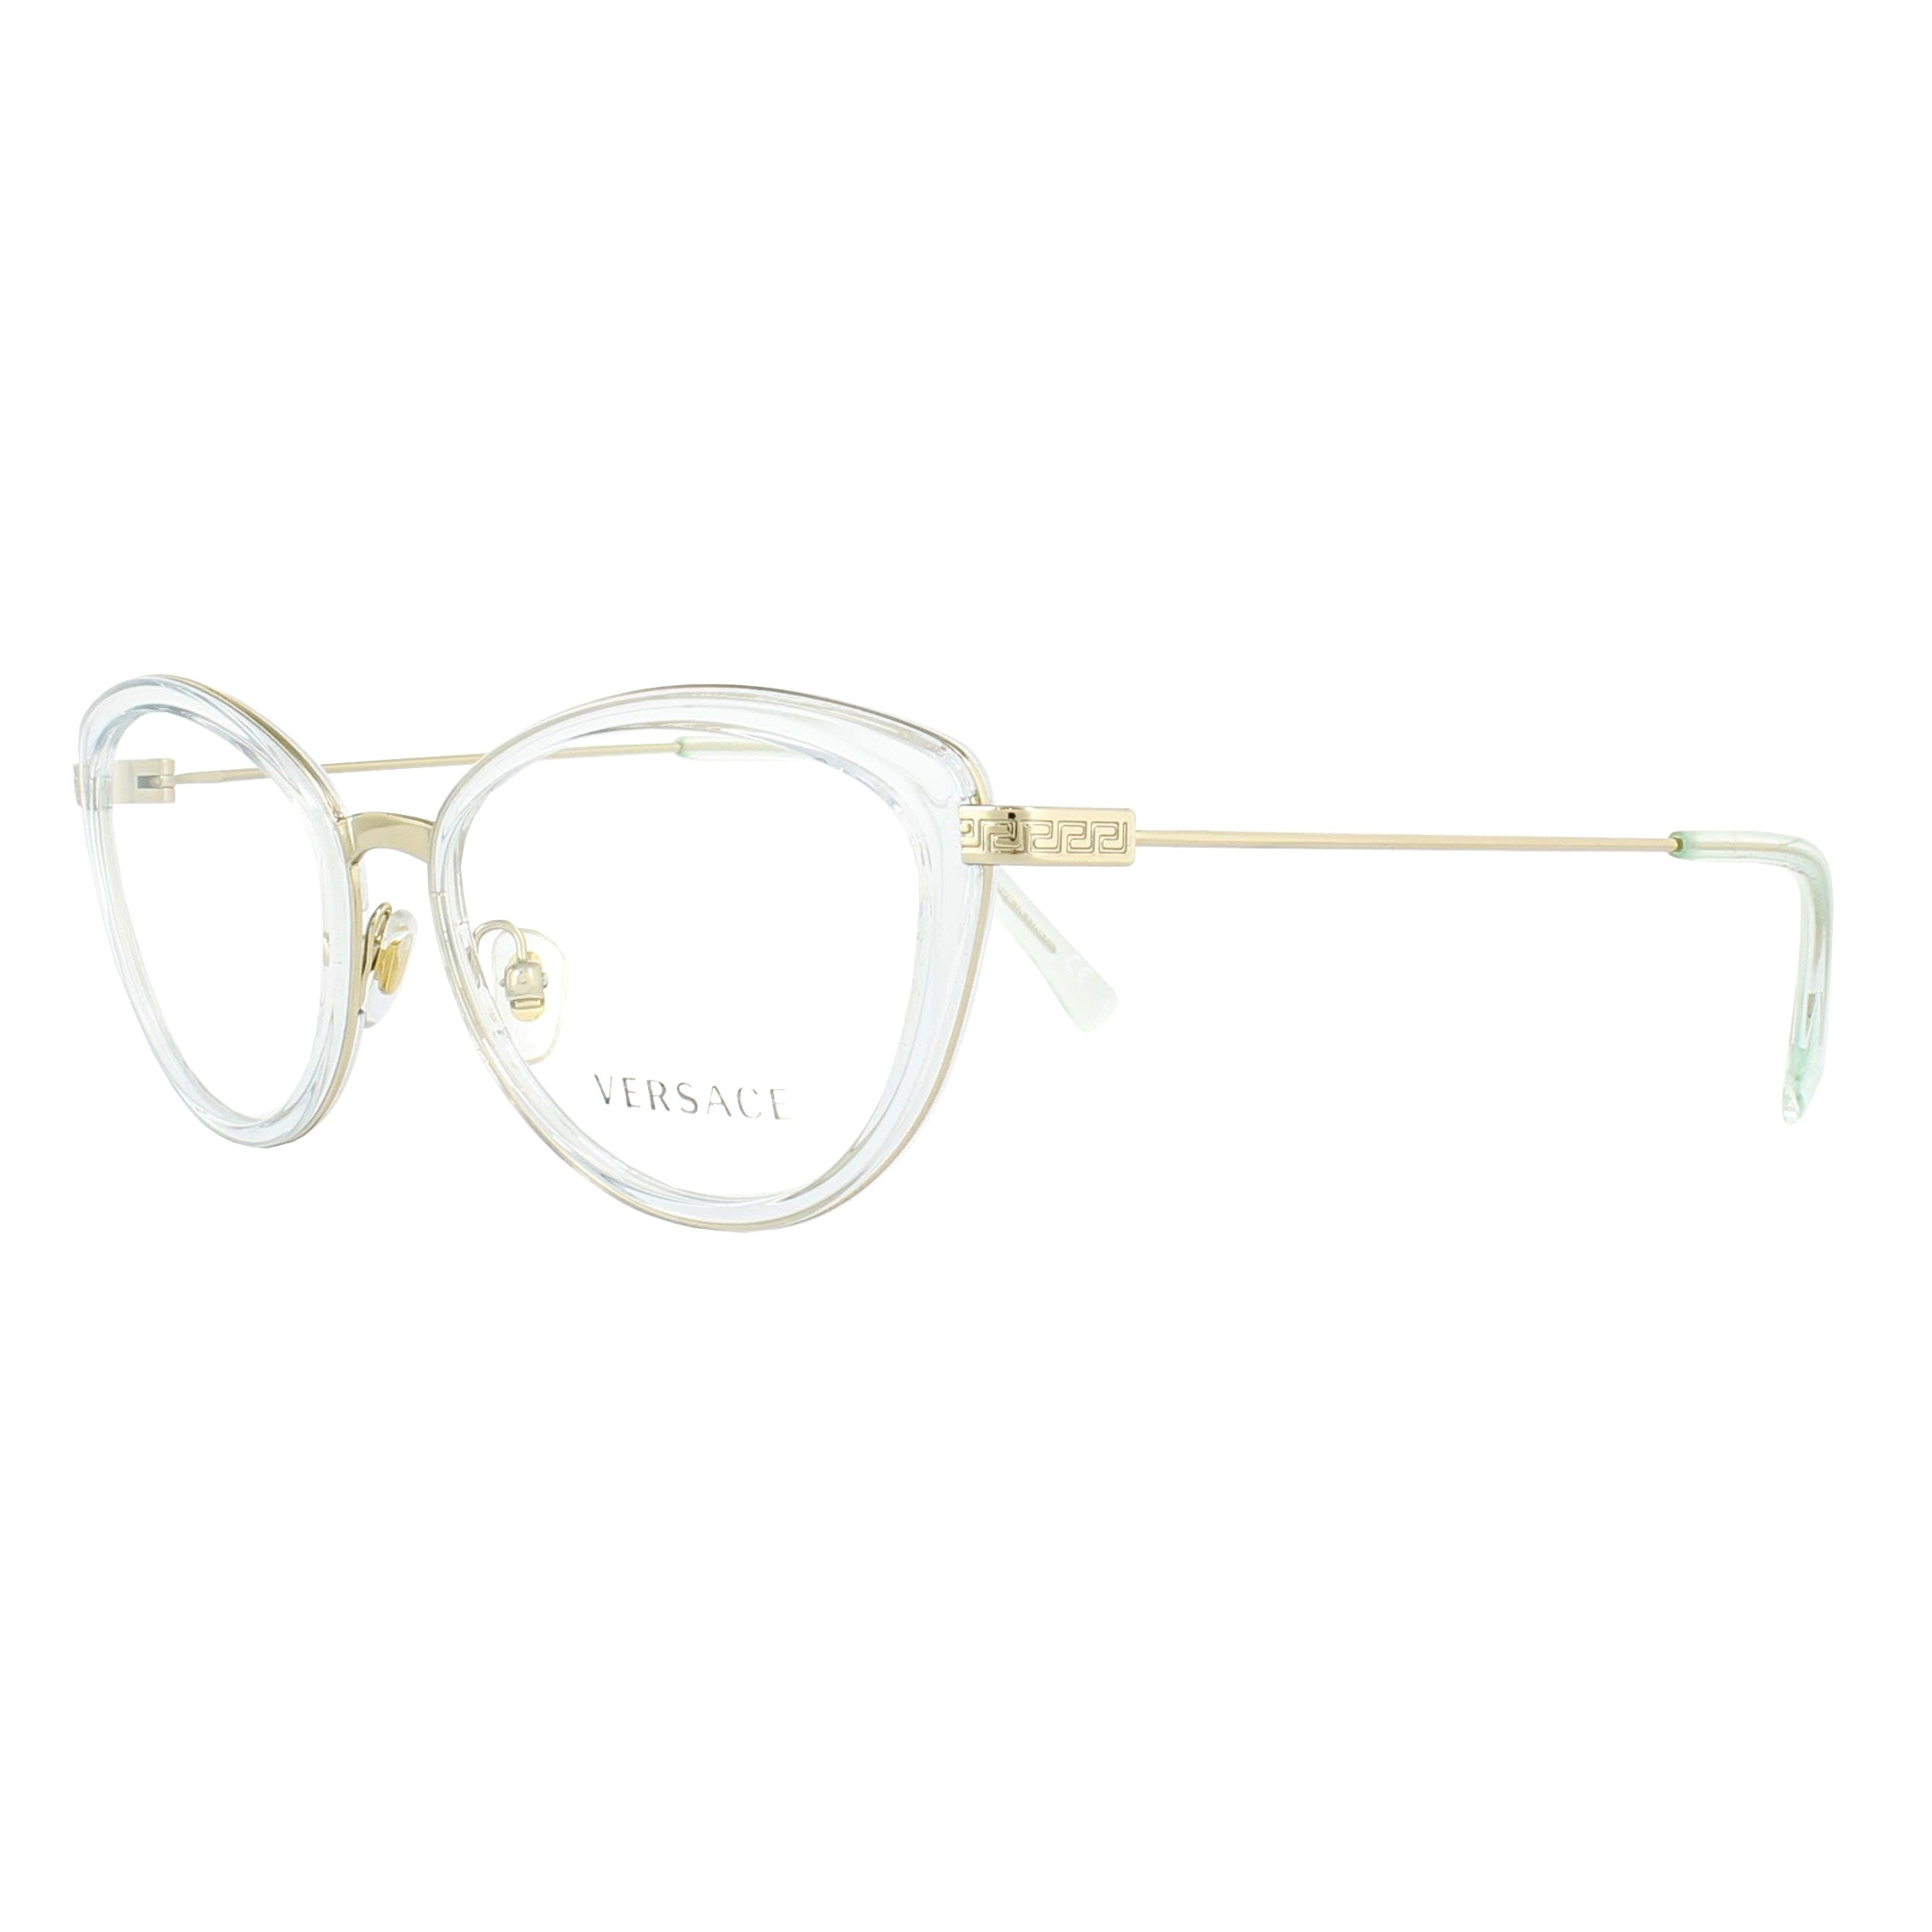 5cfd1da2a3 Details about Versace Glasses Frames 1244 1405 Light Blue Transparent    Pale Gold 53mm Womens